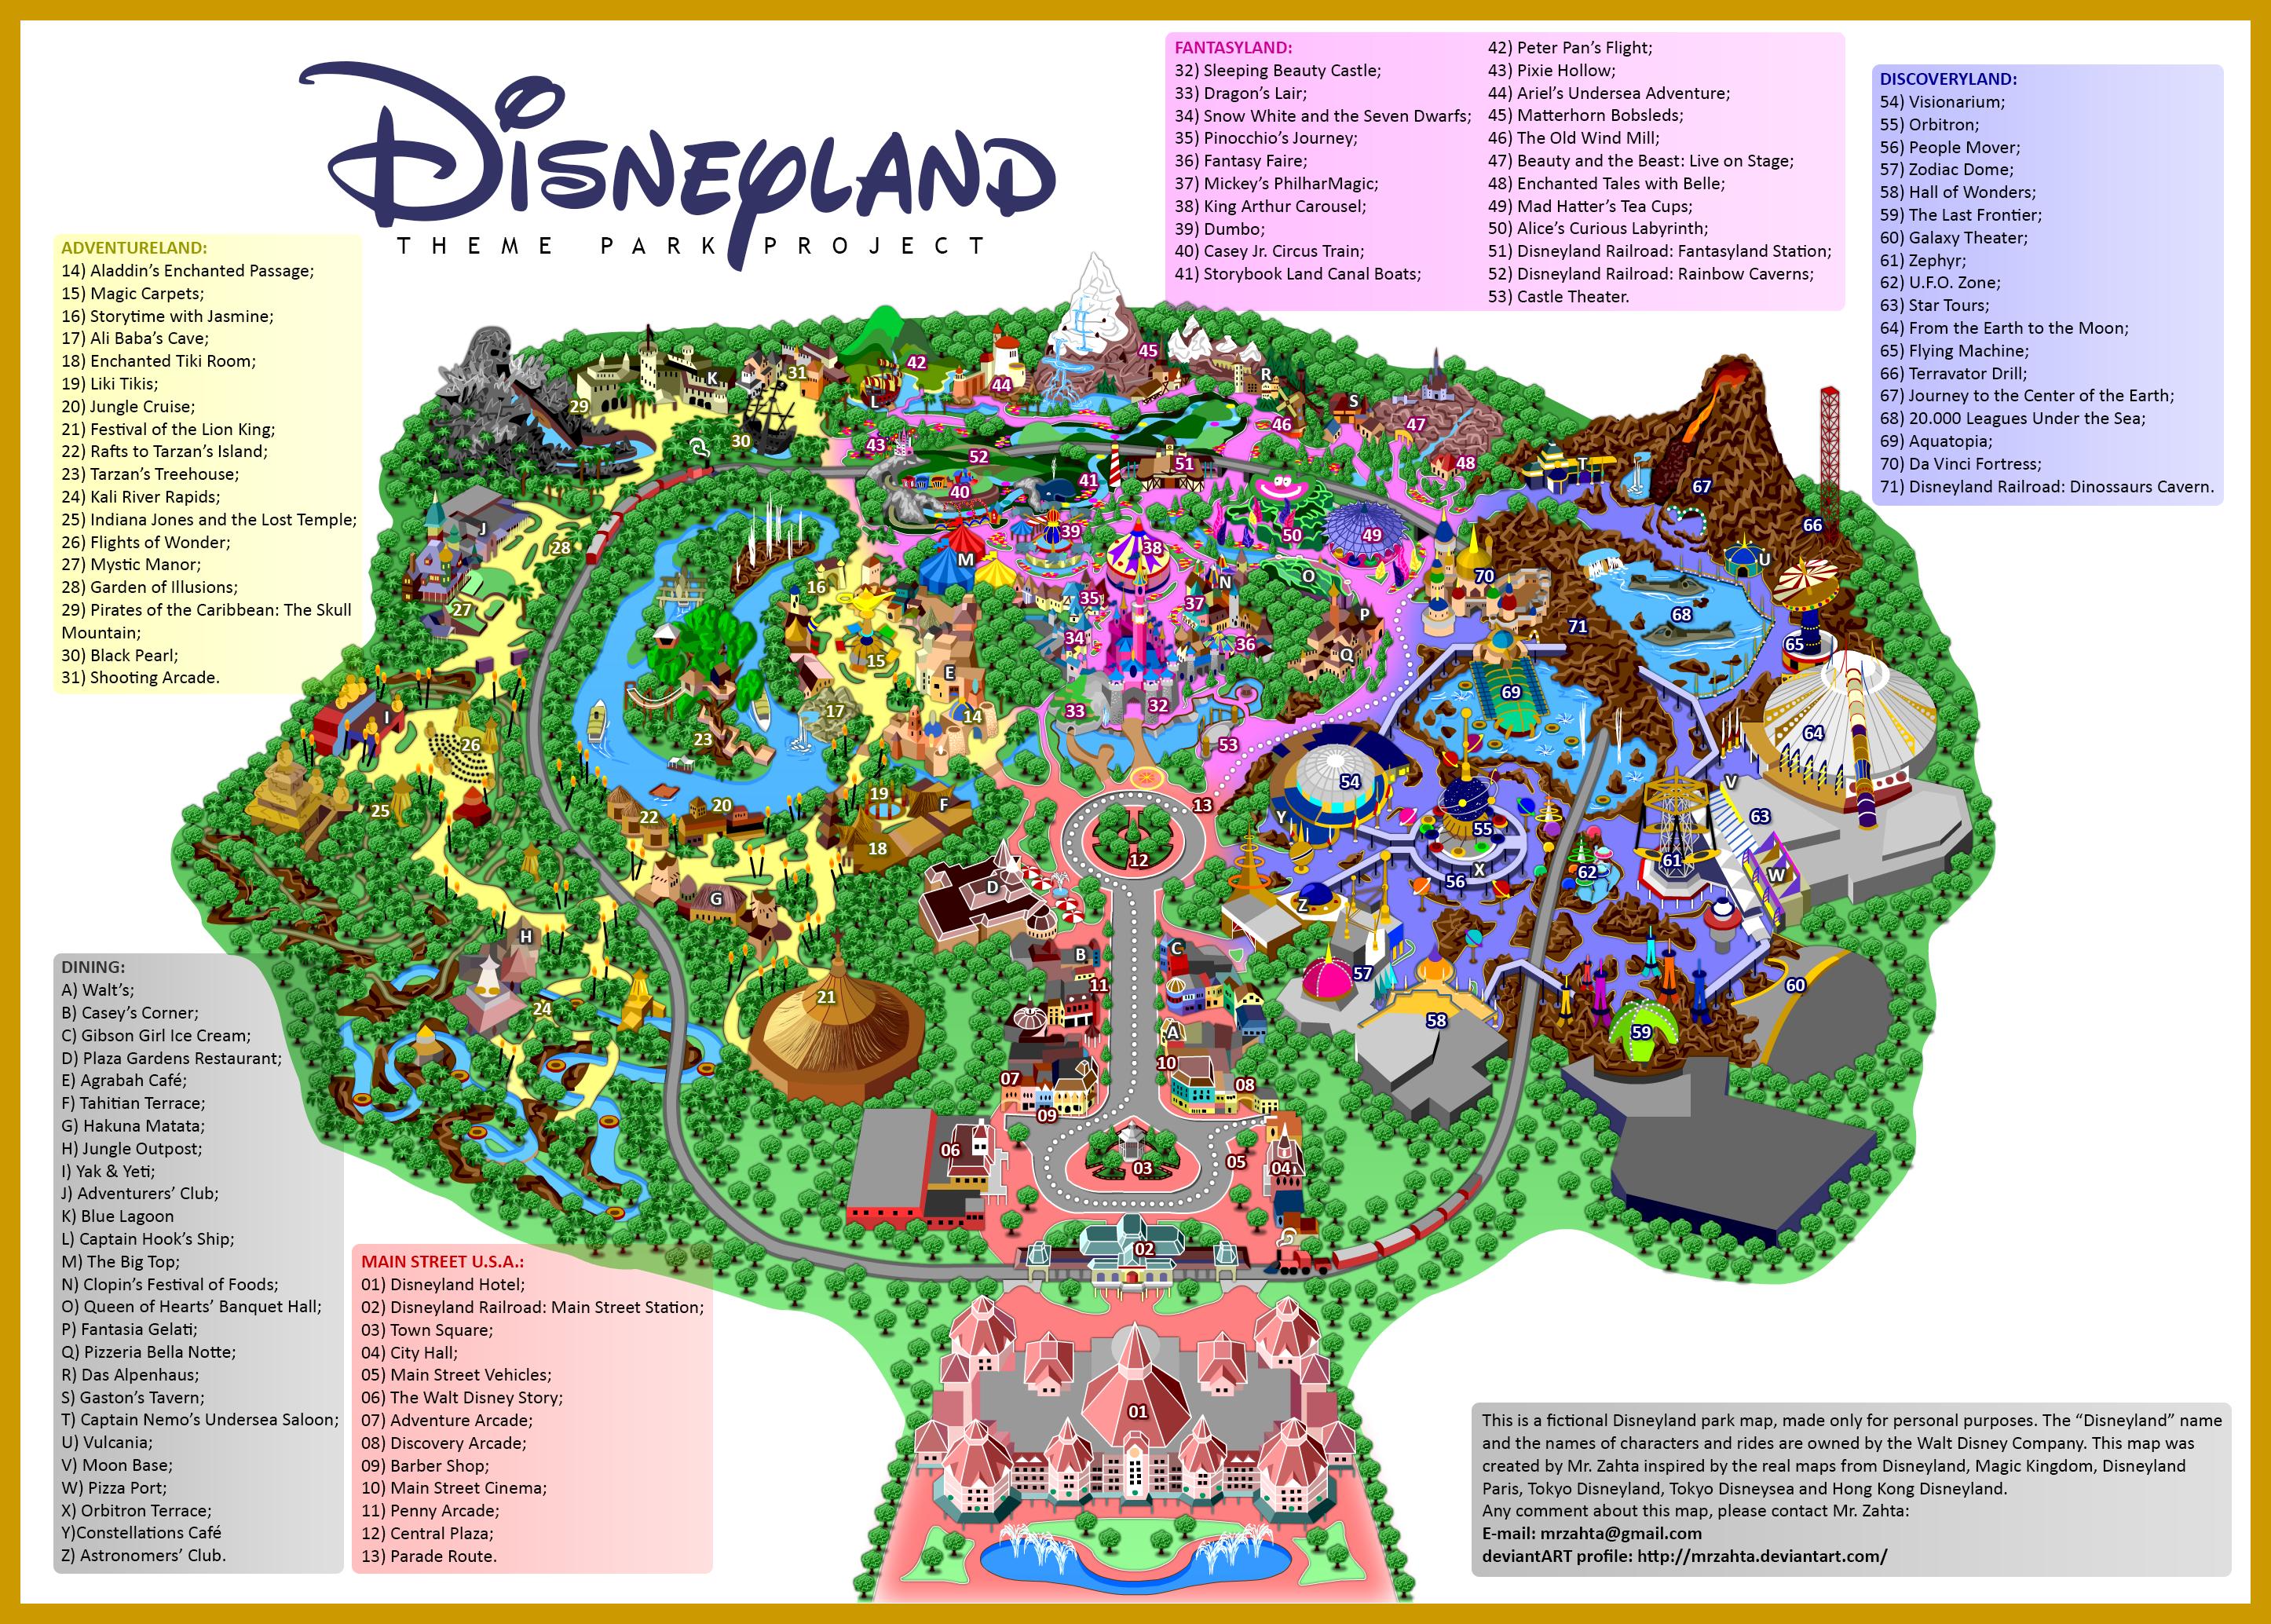 disney world maps printable with Disneyland 13 3 410077538 on World Radio Map 176569 00 11 05 also Iata Areas Of The World Map 177444 00 17 06 besides Printable Map Of Florida additionally Photo besides Neverland Map.